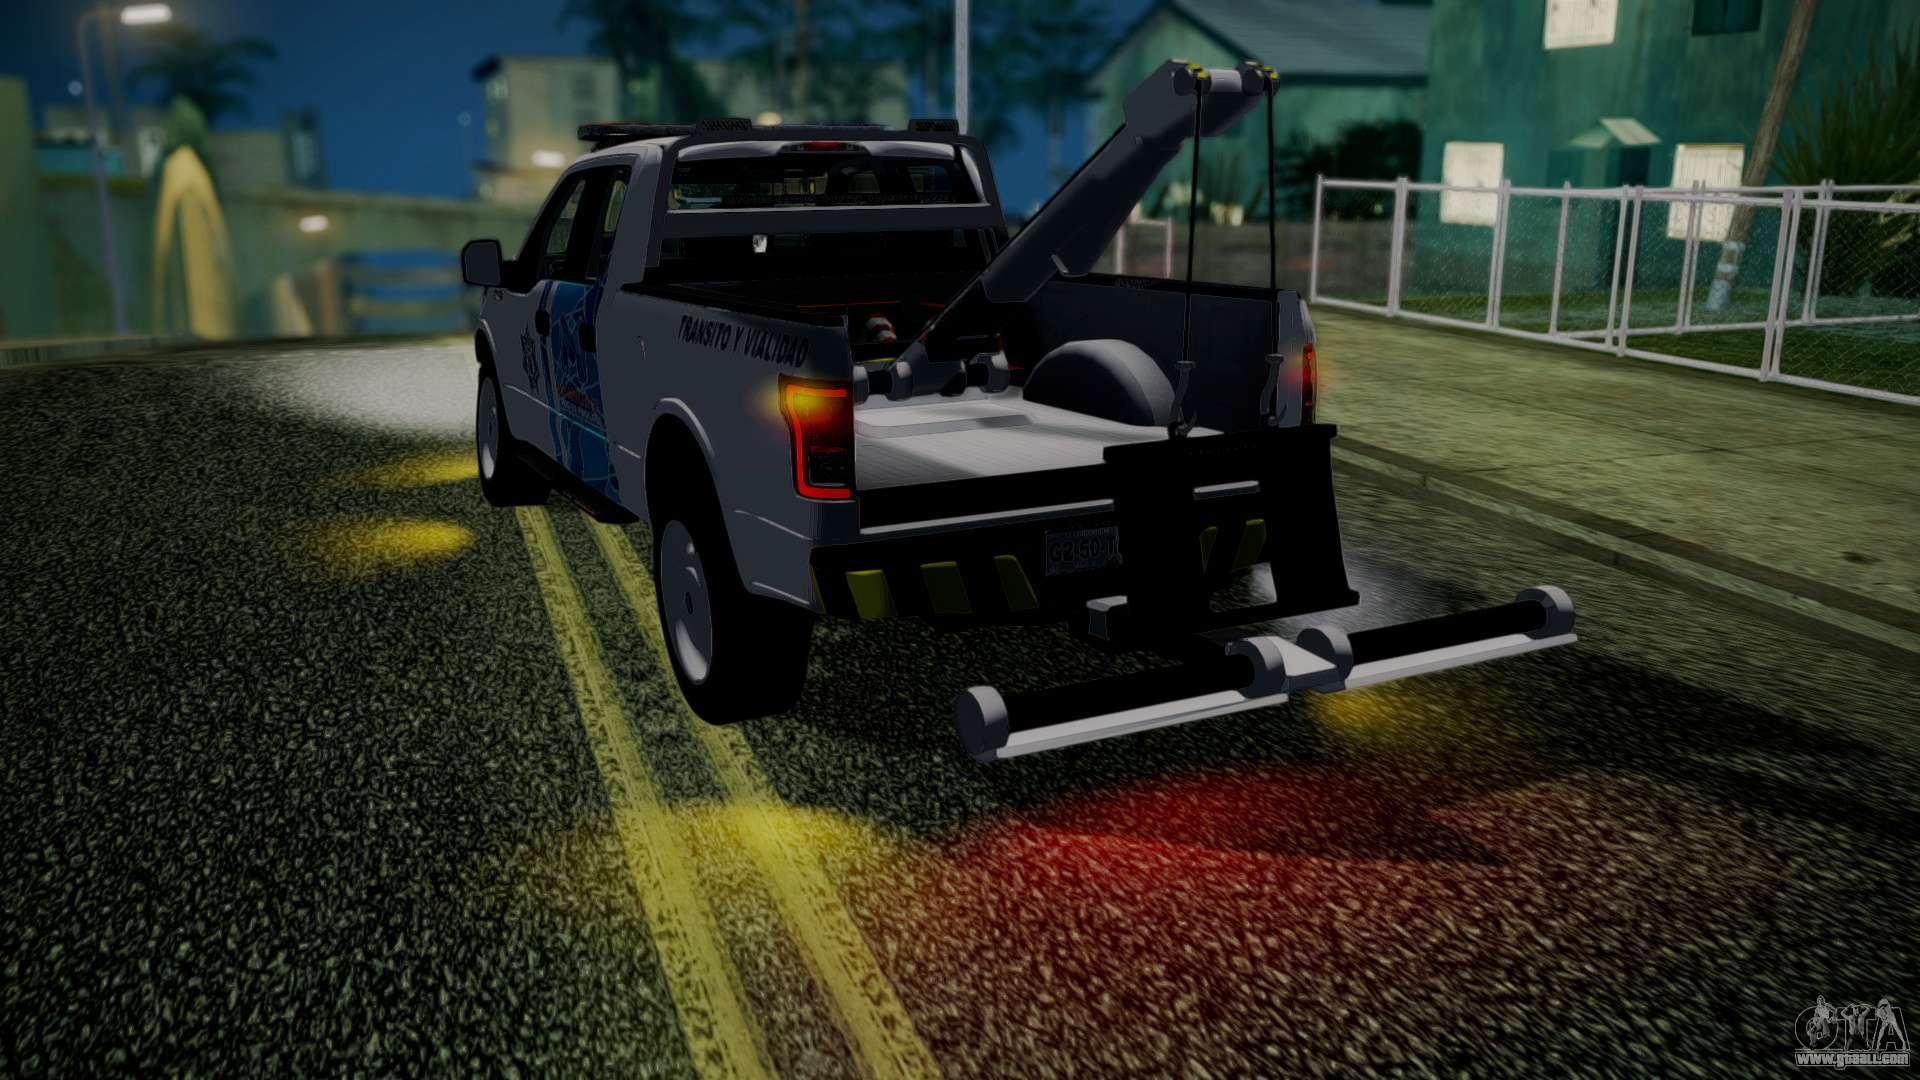 Gta San Andreas Tow Truck Mod